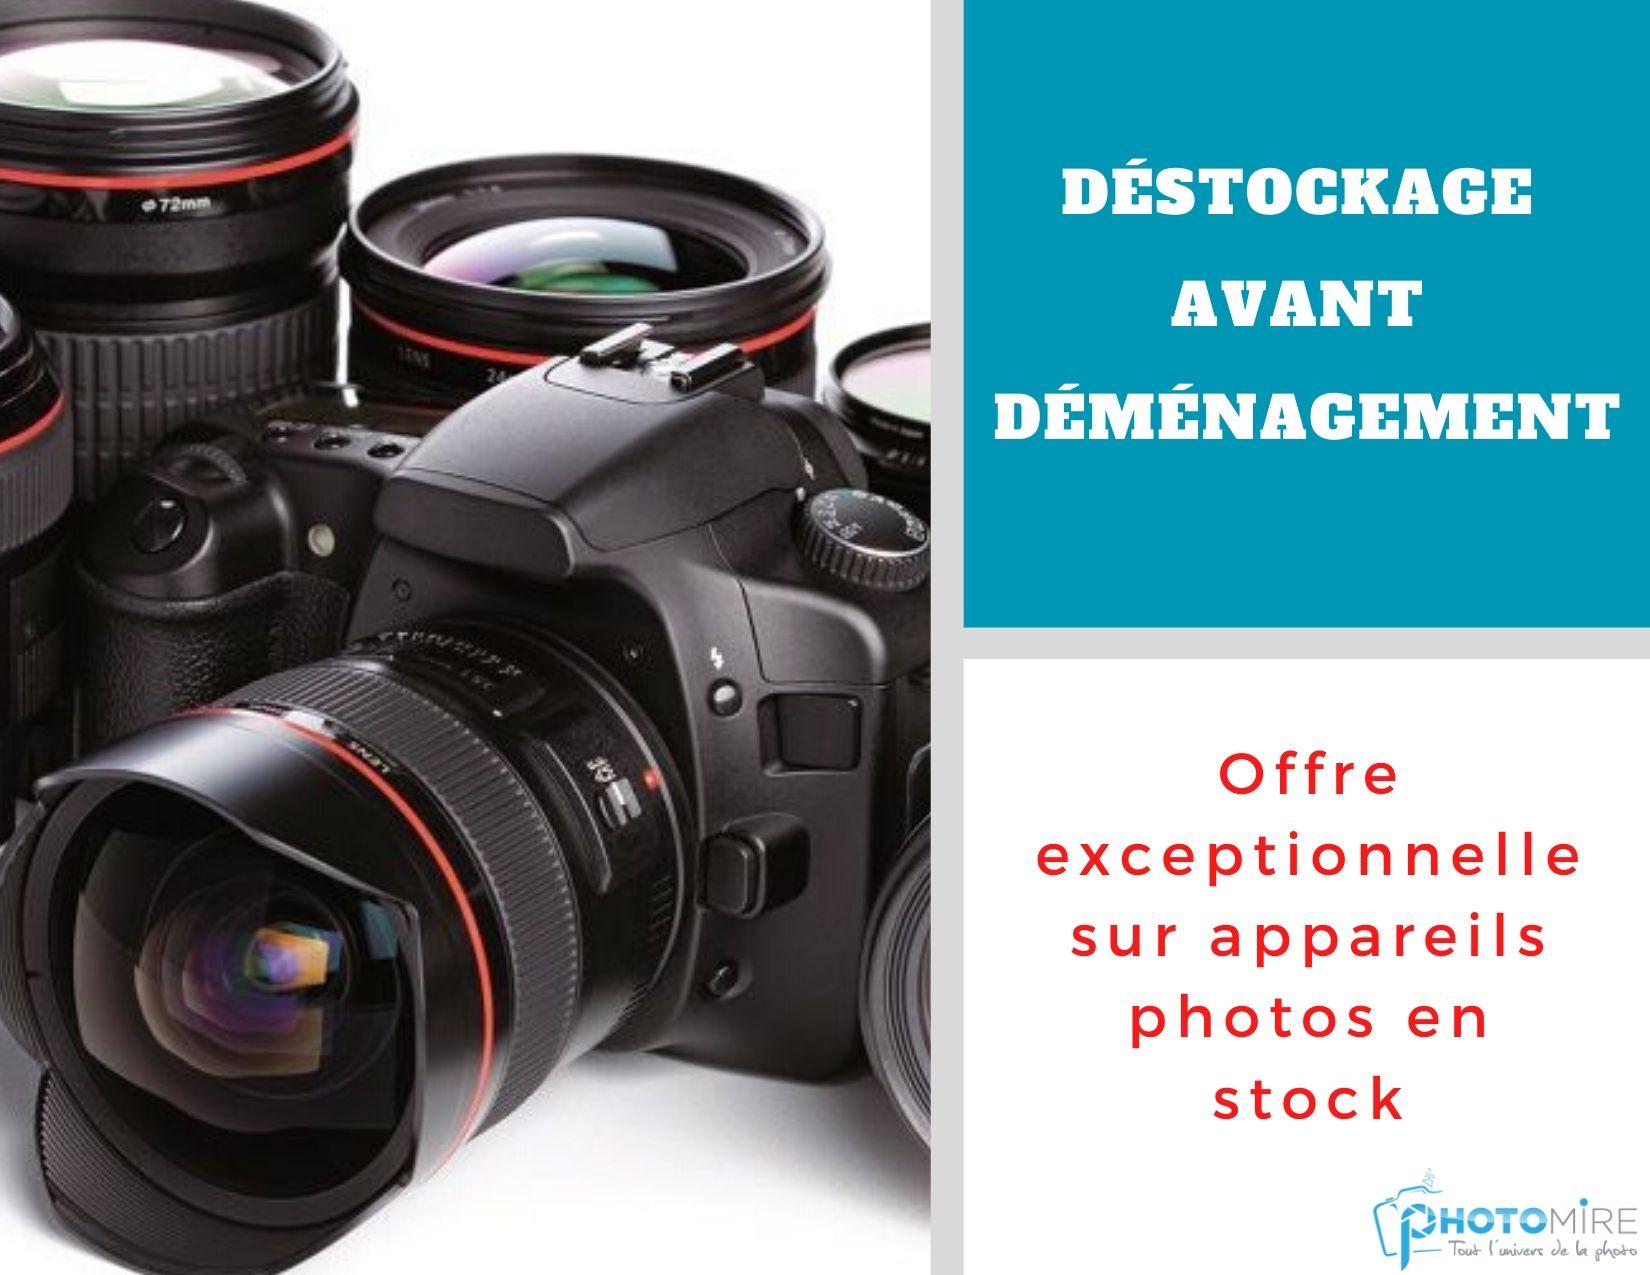 destockage photomire appareils photos